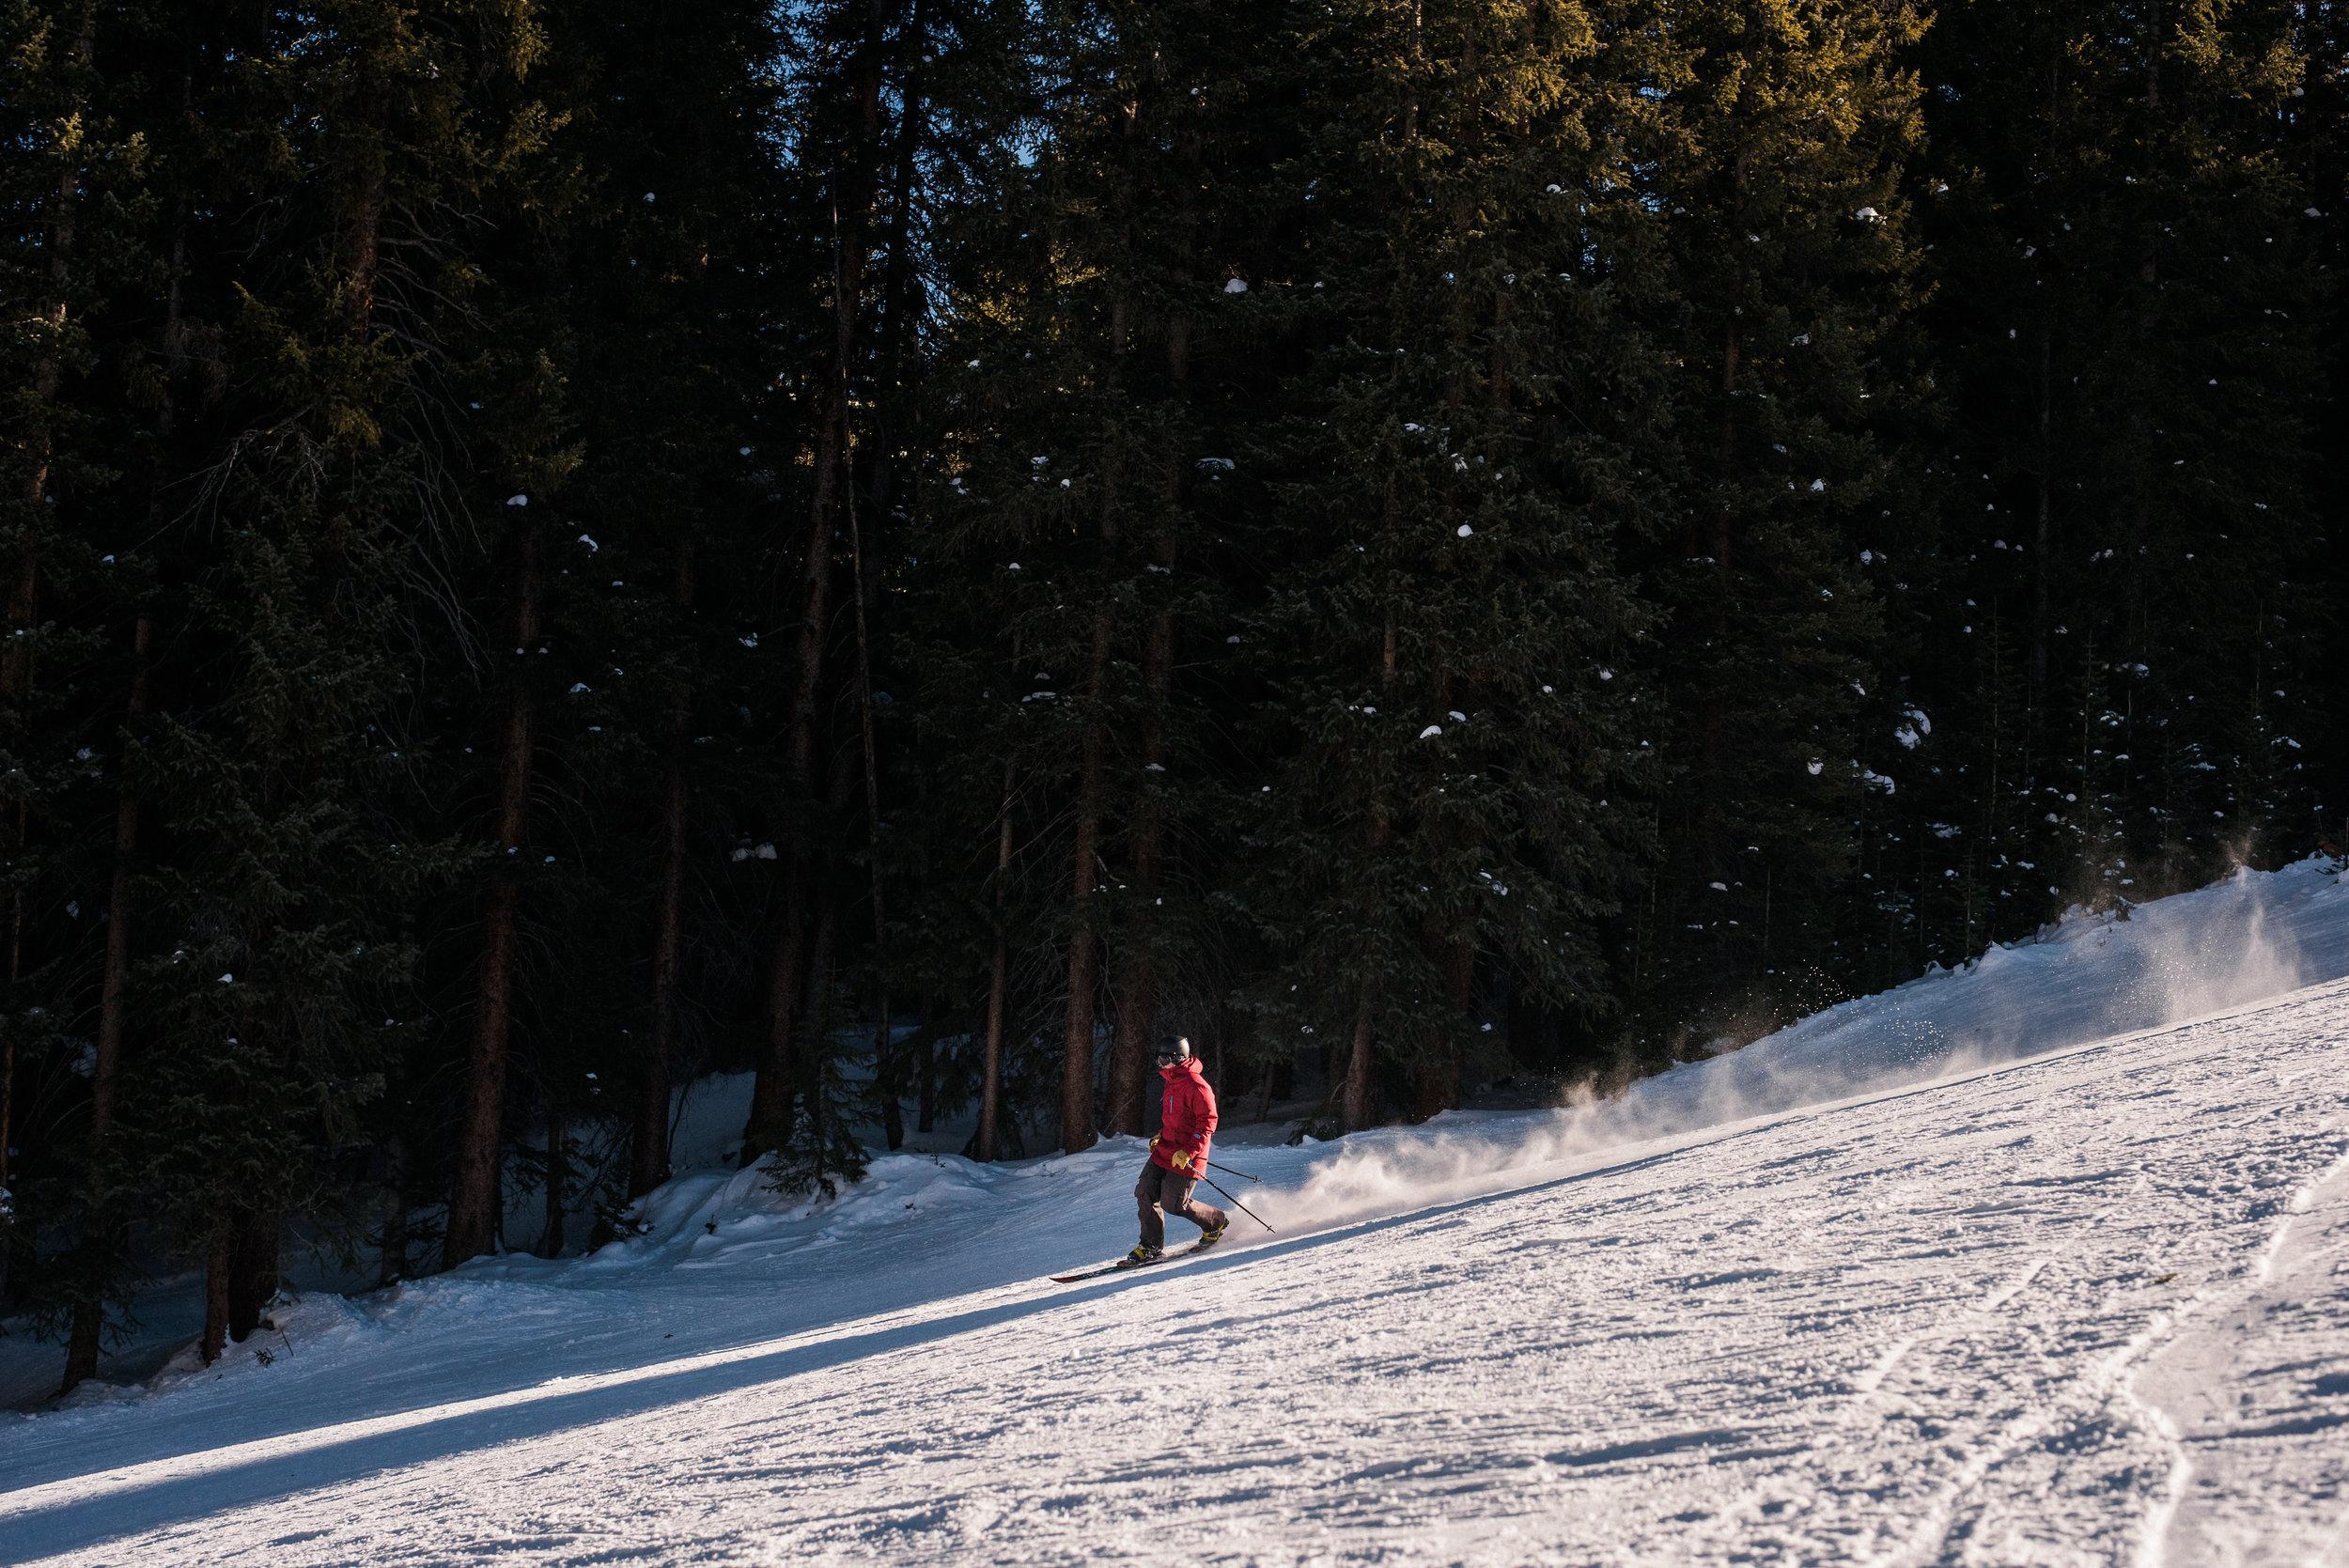 TaraShupe_Outdoor_Photographer_Loweprobags_Colorado_Copper_Mountains_Ski_43.jpg